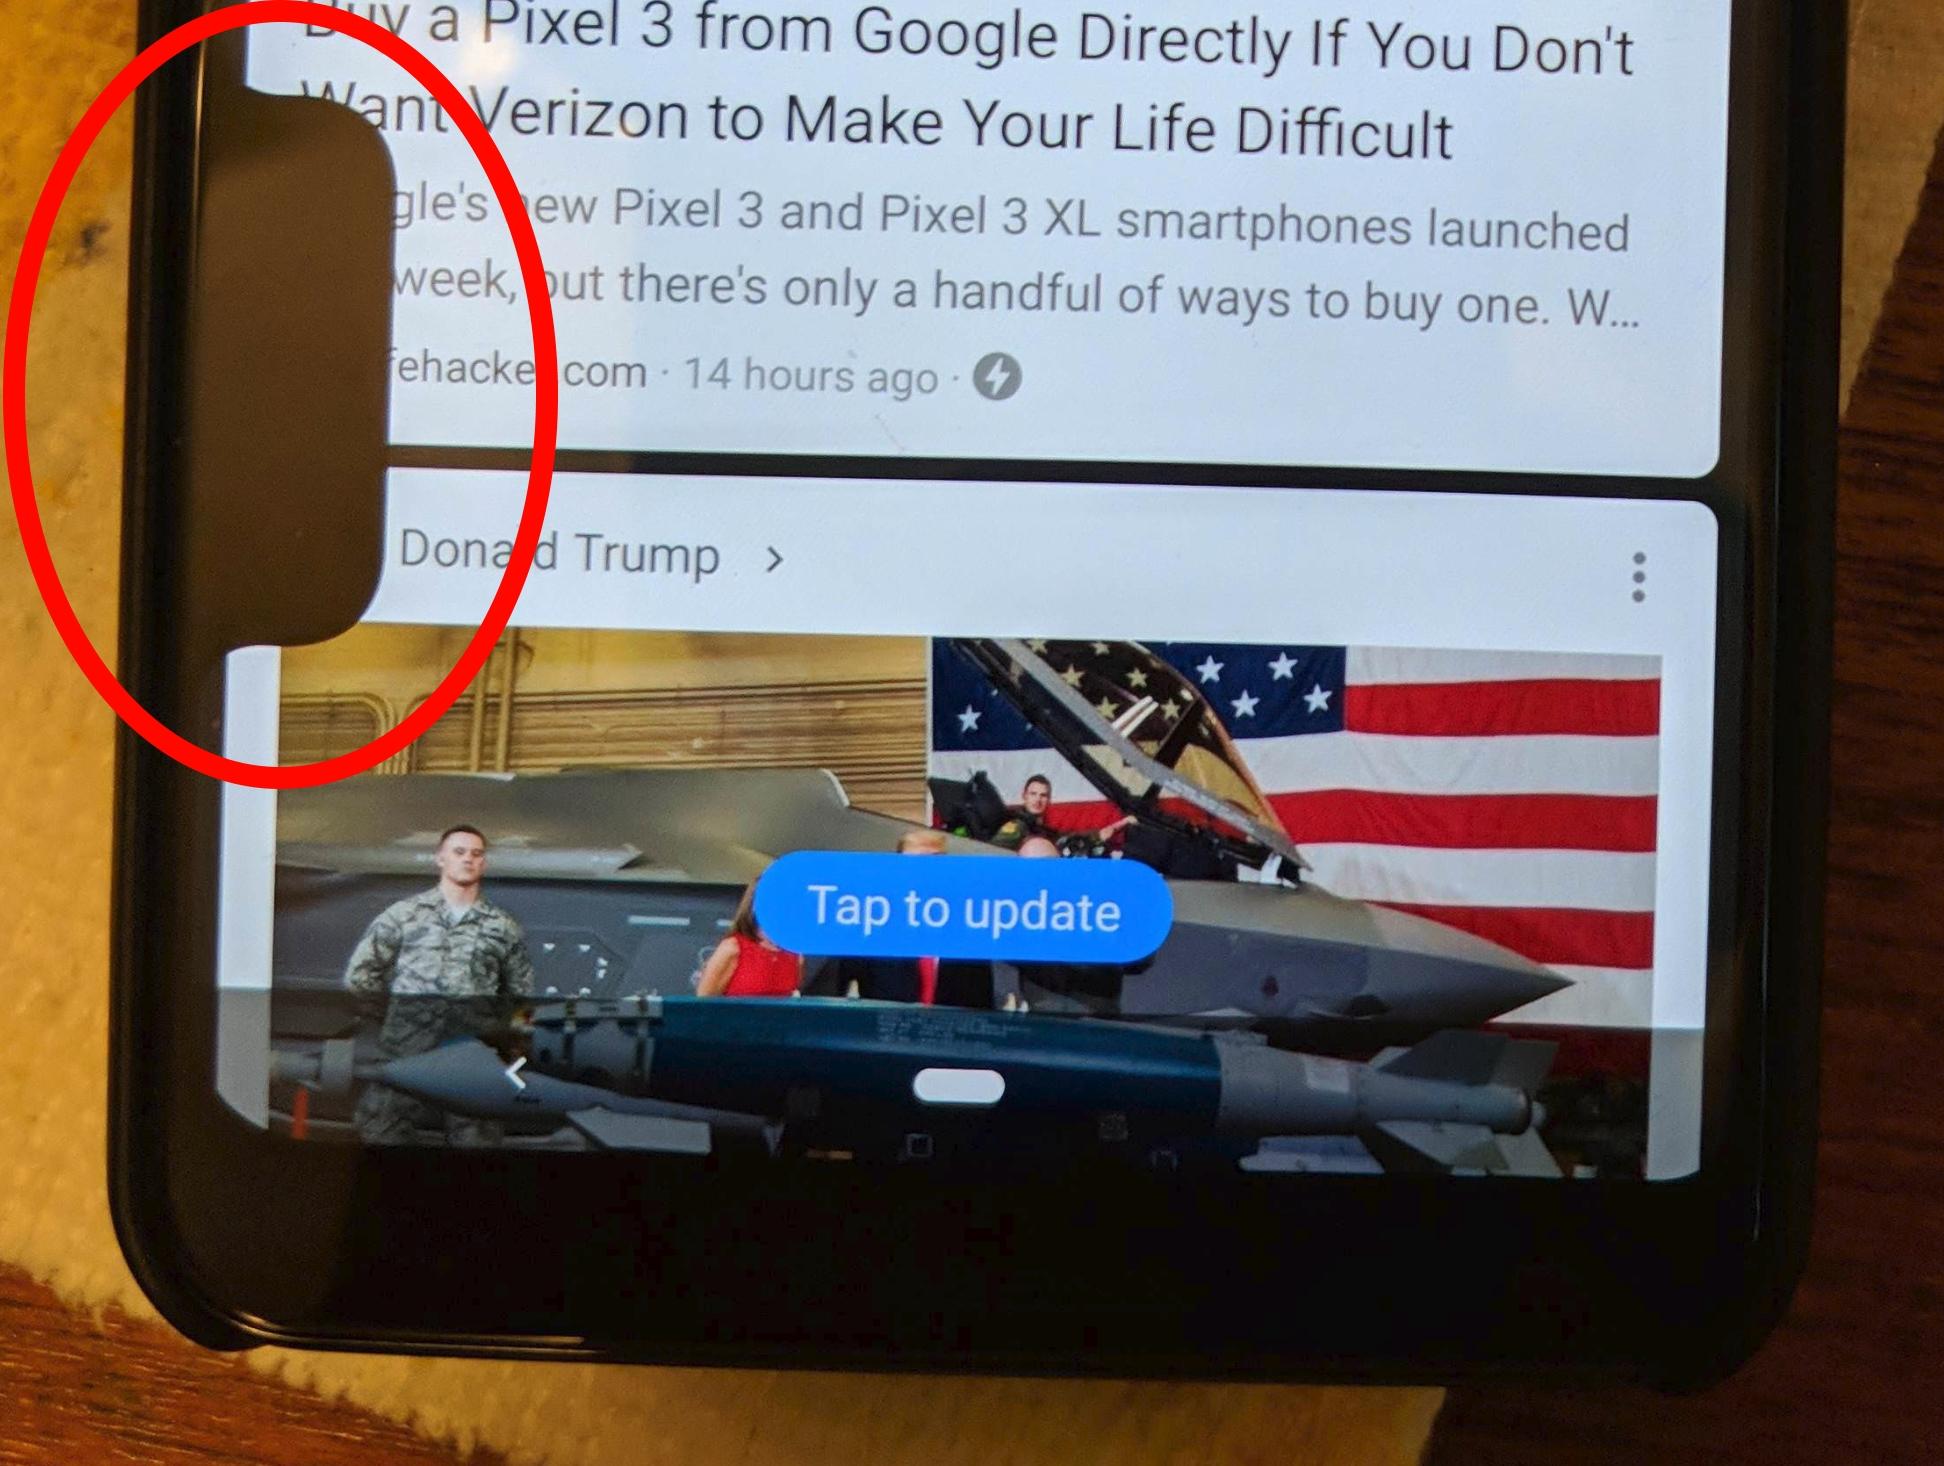 Haha - se, Pixel 3 har fått enda en busslomme!